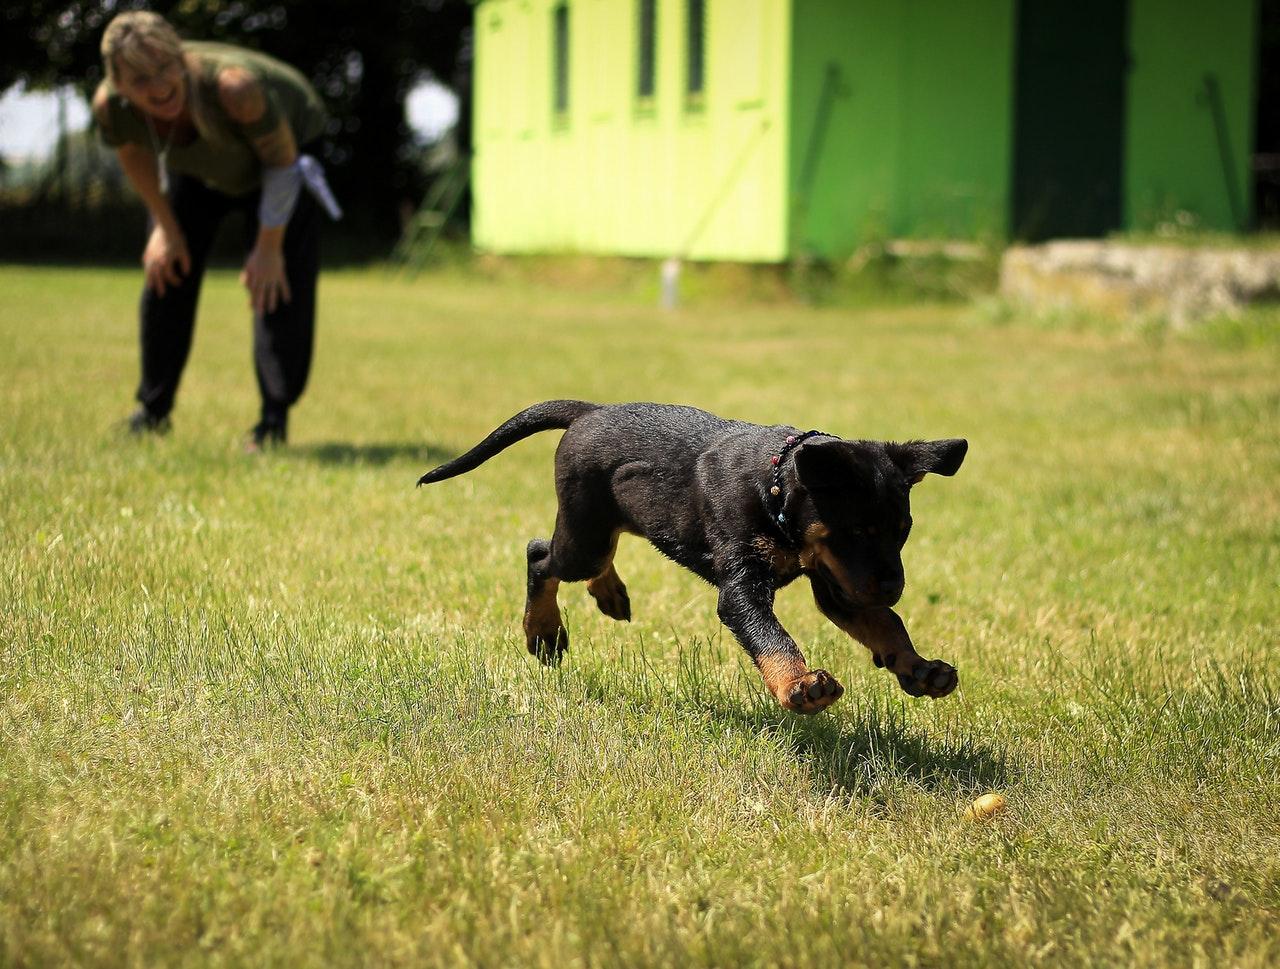 Best New Dog Trainer Job Opportunities - Wednesday 10/28